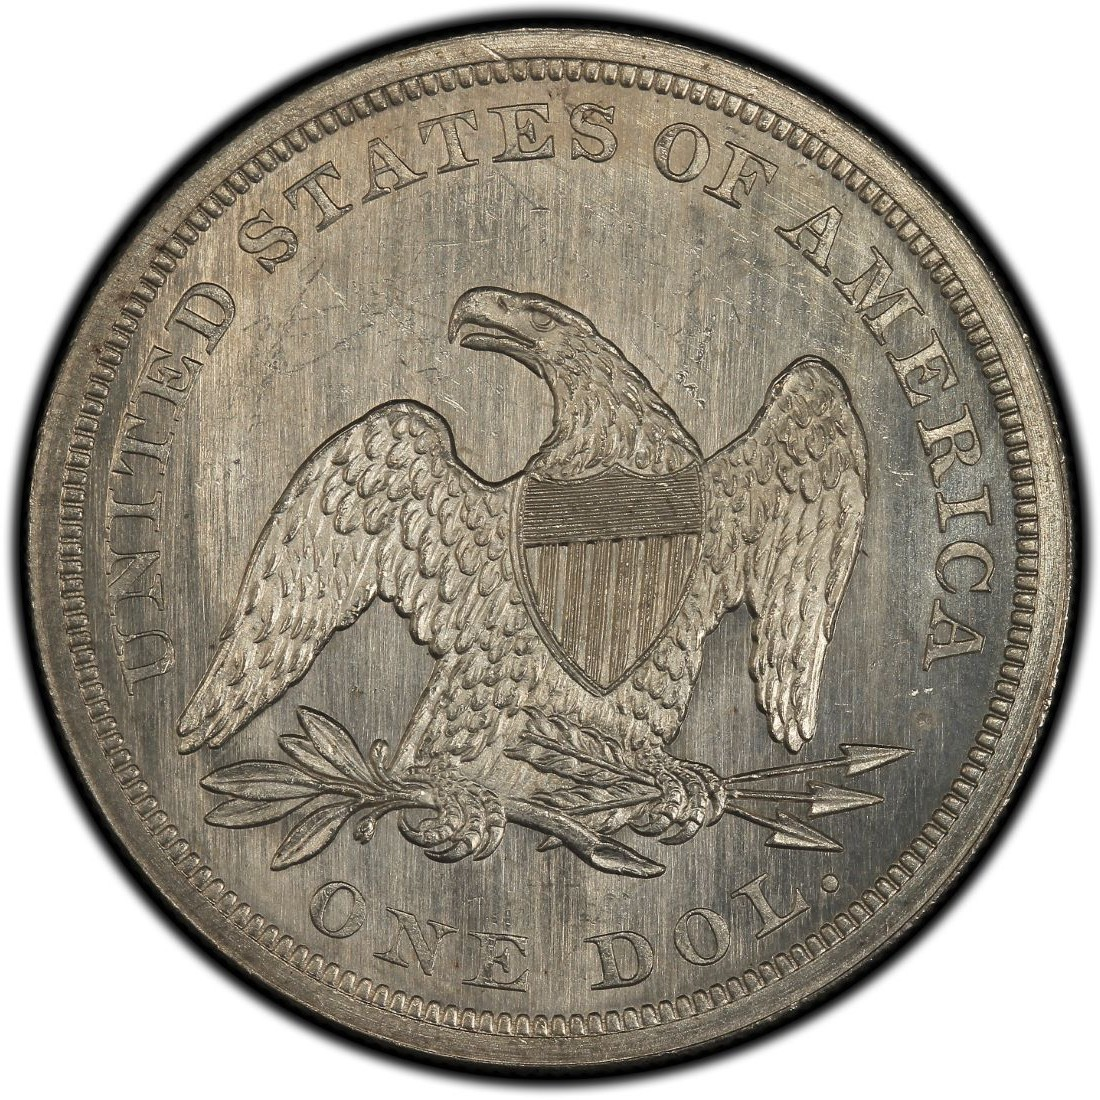 1 Oz Silver Eagle Mintage 2019 1oz American Silver Eagle